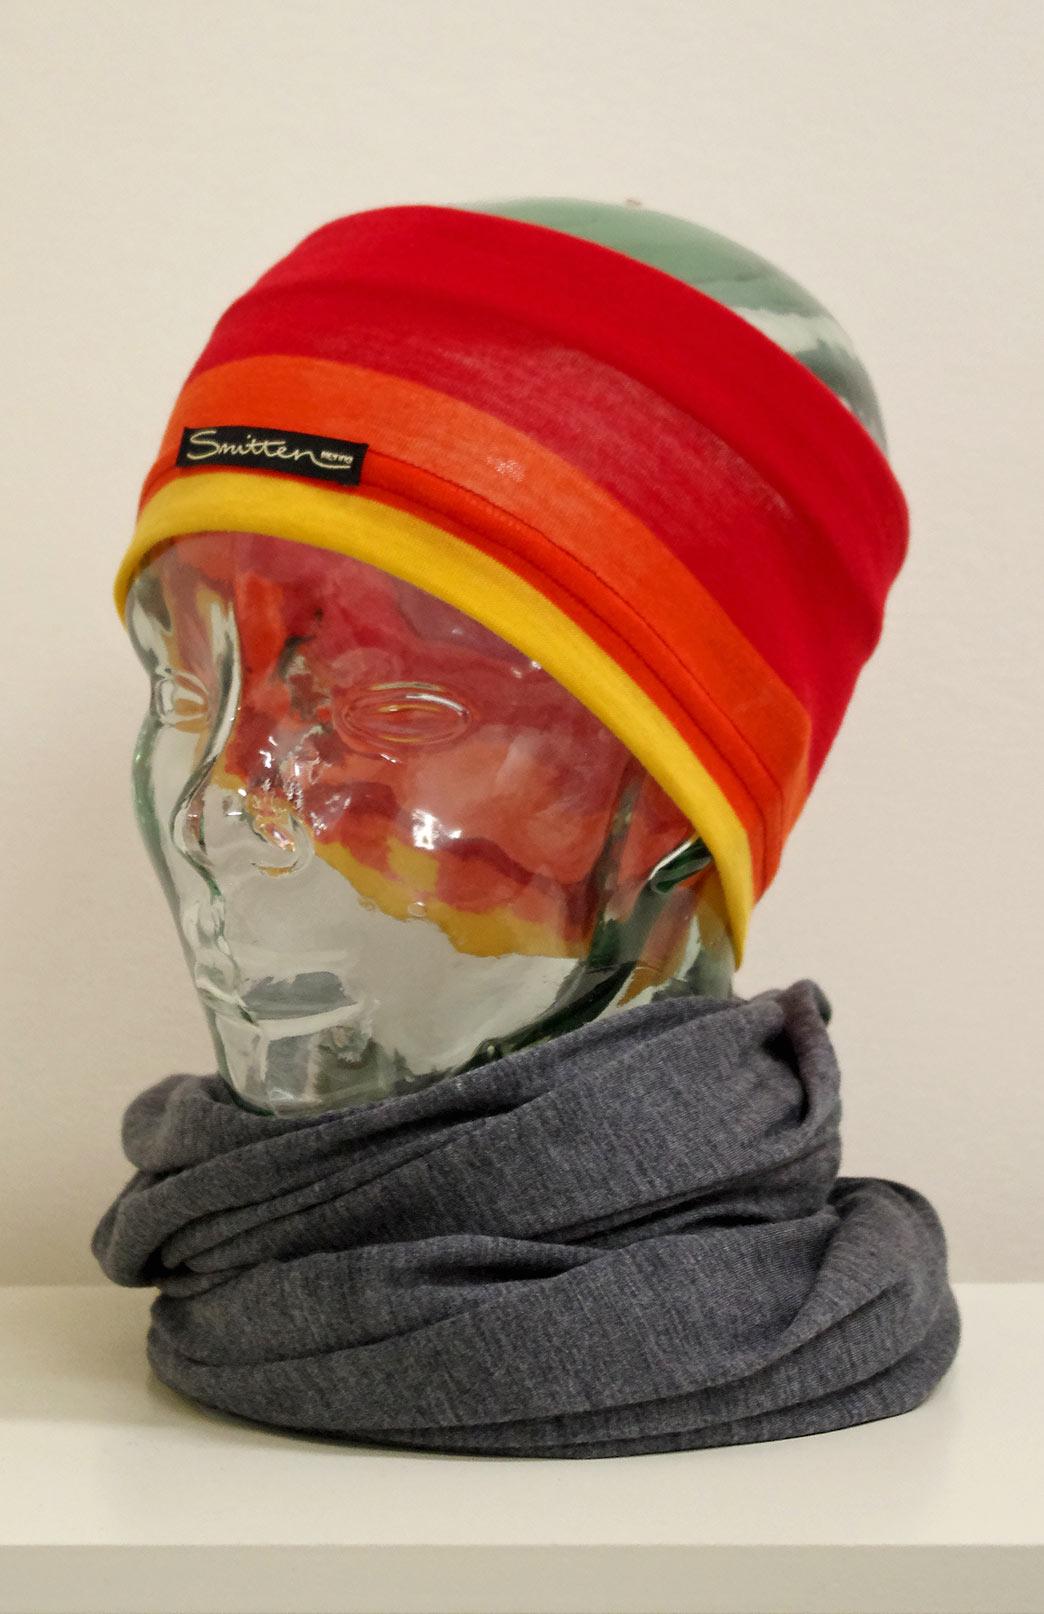 Headband / Ear Warmer - Unisex Bright Multi Merino Wool Headband and Ear Warmer - Smitten Merino Tasmania Australia